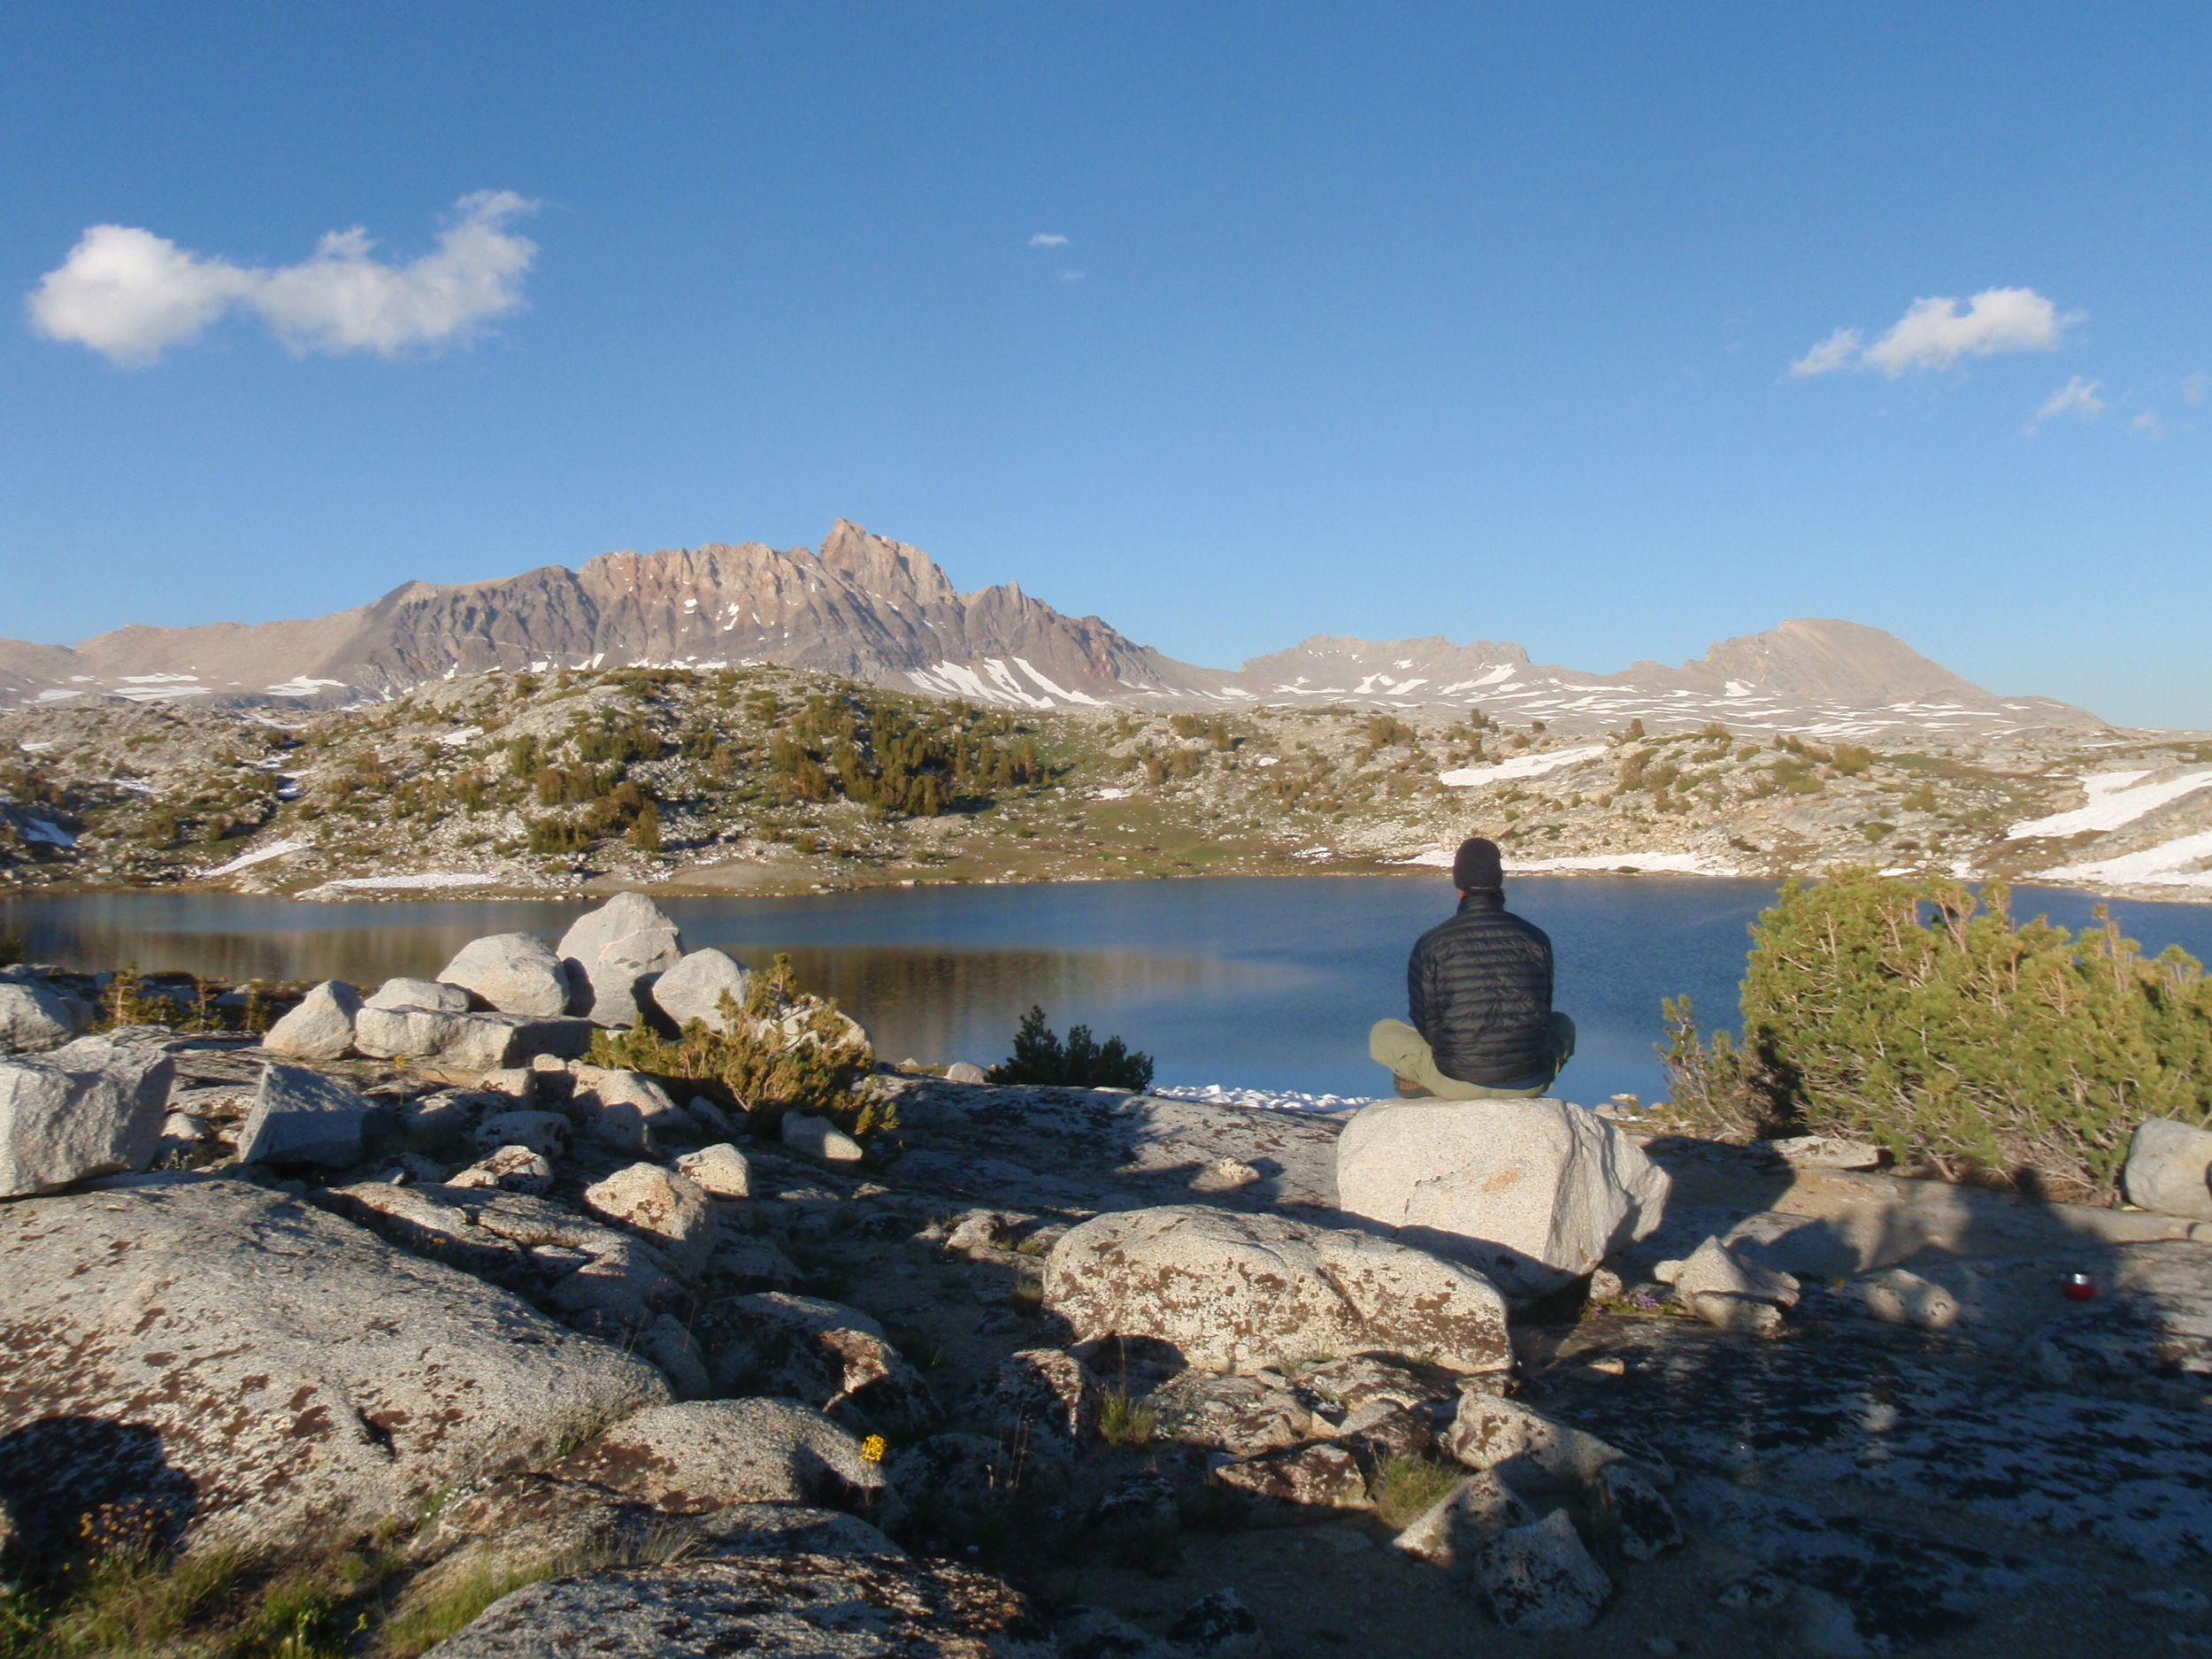 Mt Humphreys across Tomahawk Lake